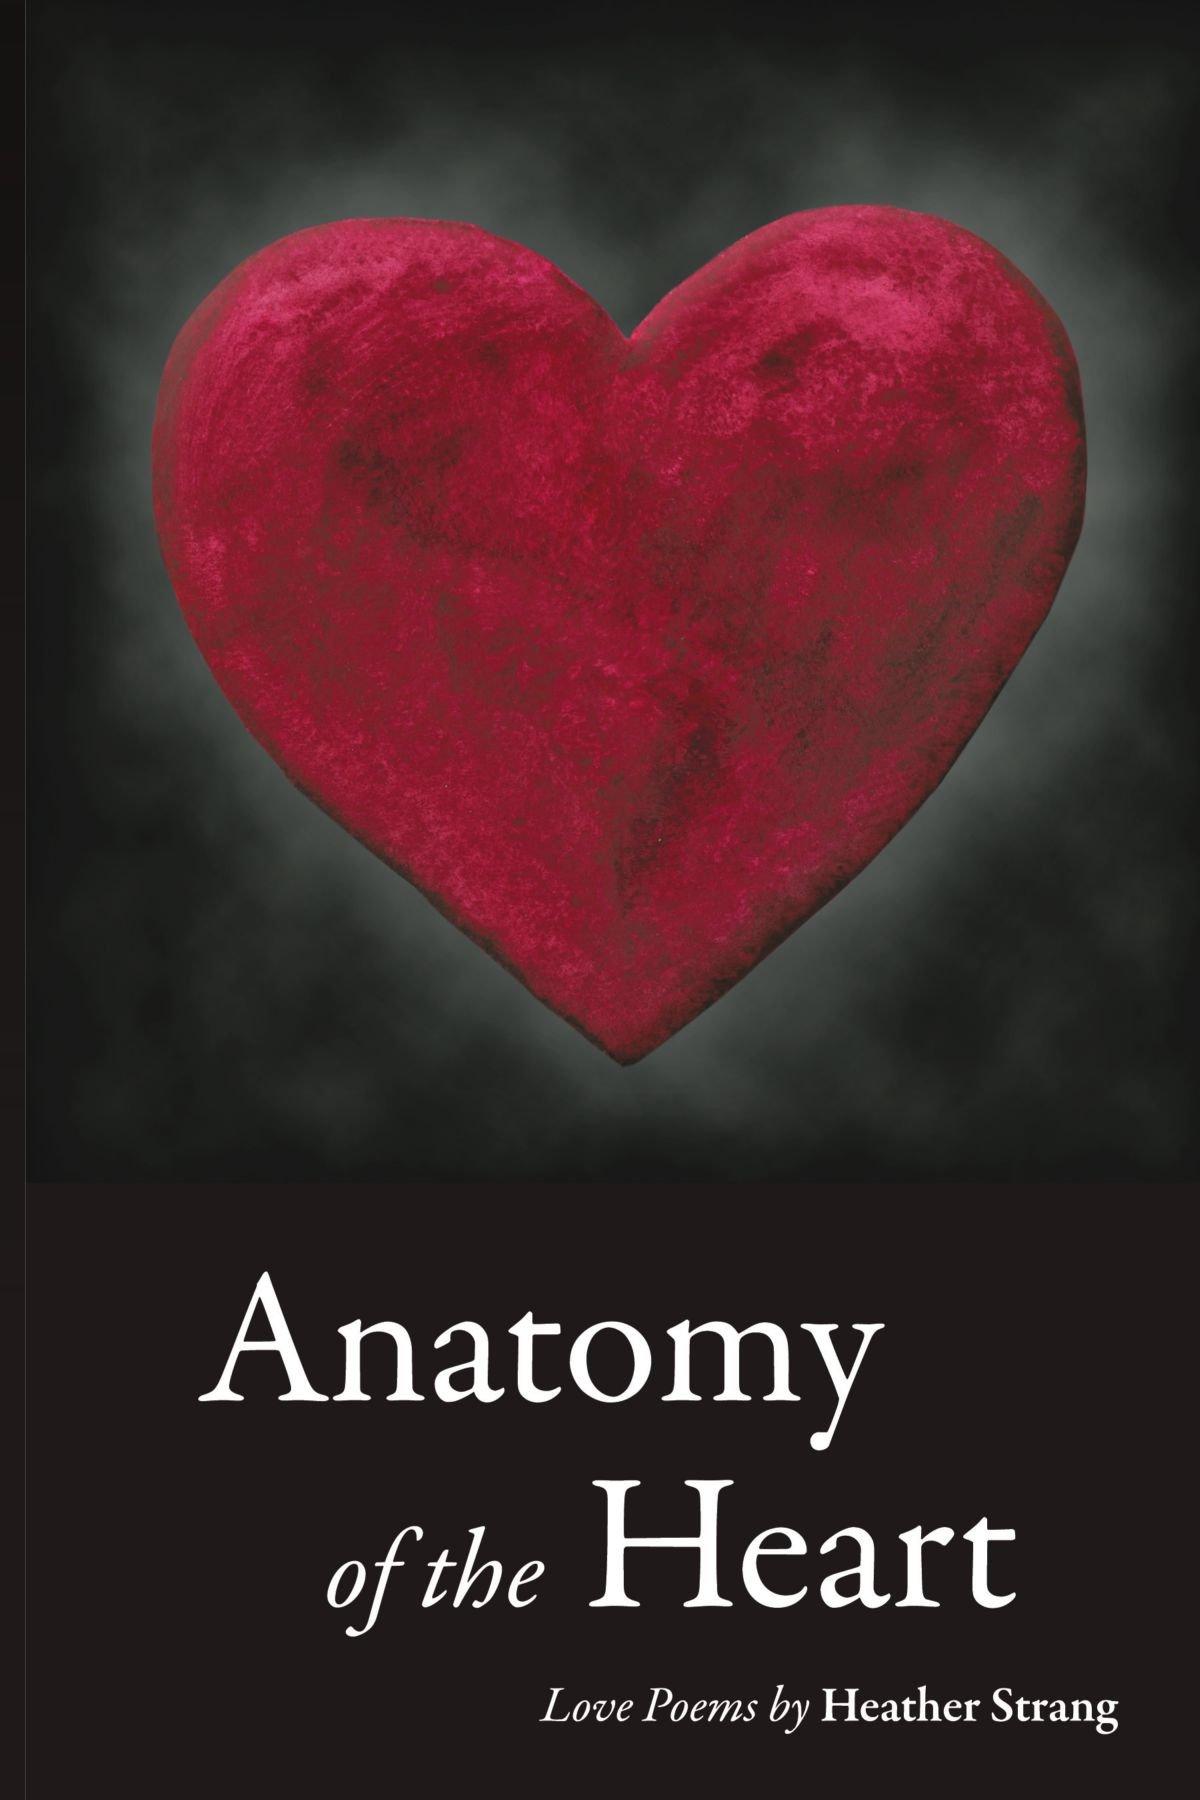 Anatomy of the Heart: Love Poems: Amazon.co.uk: Heather Strang ...